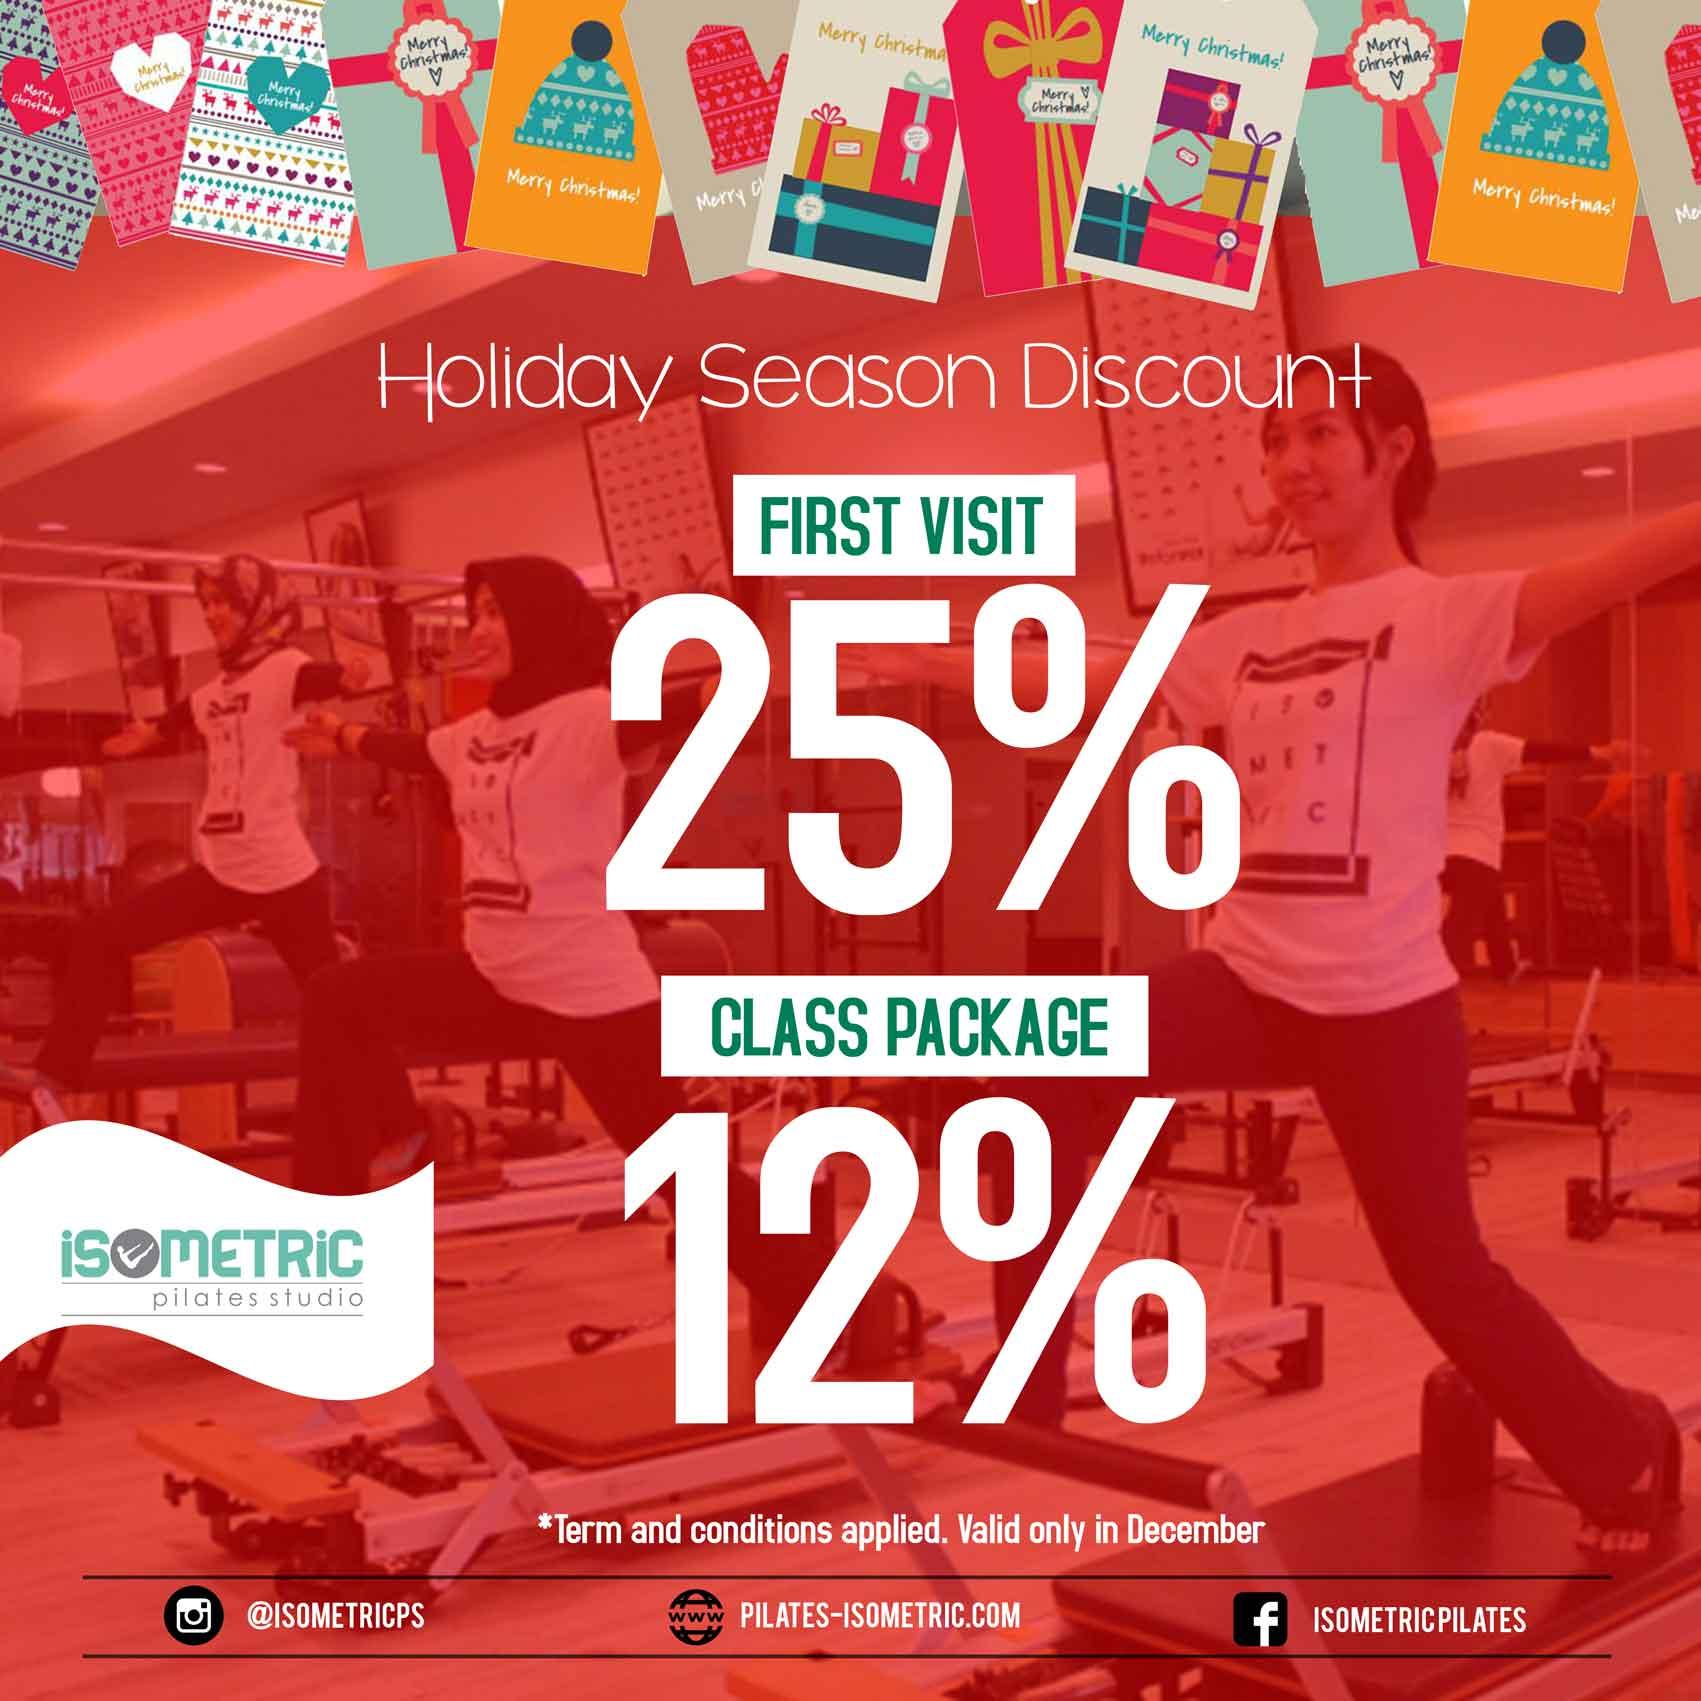 Pilates Holiday Season Discount